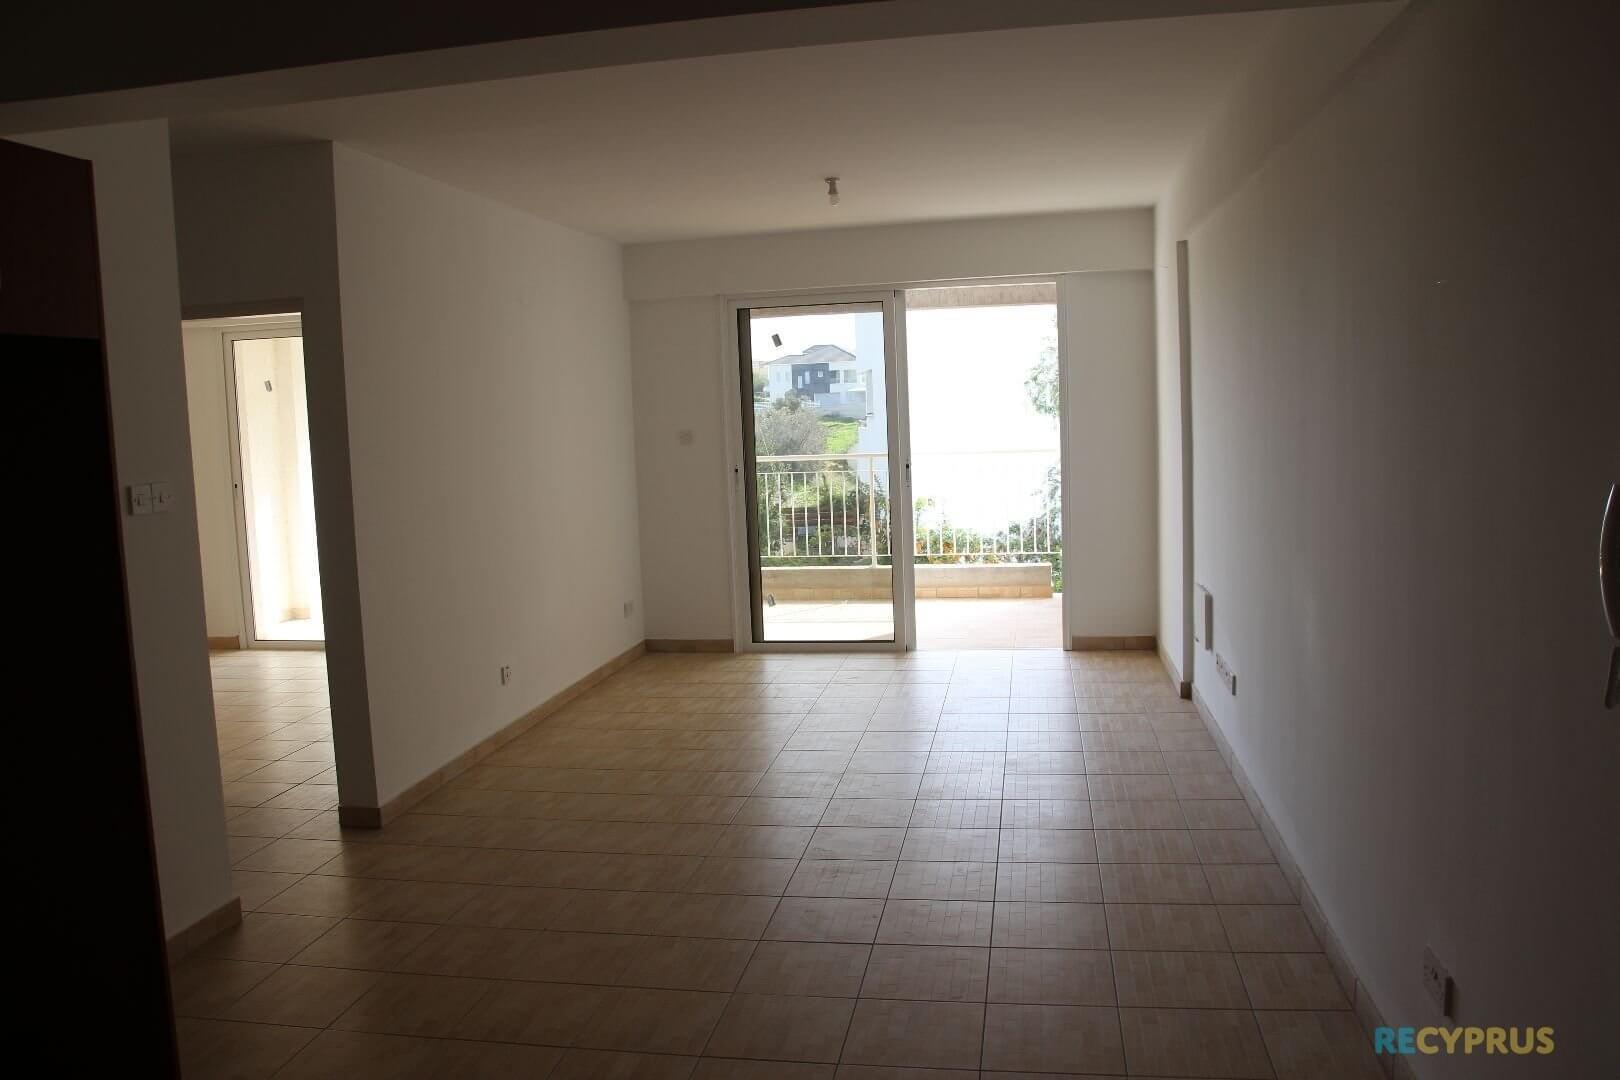 Apartment for sale Kapparis Famagusta Cyprus 4 3519